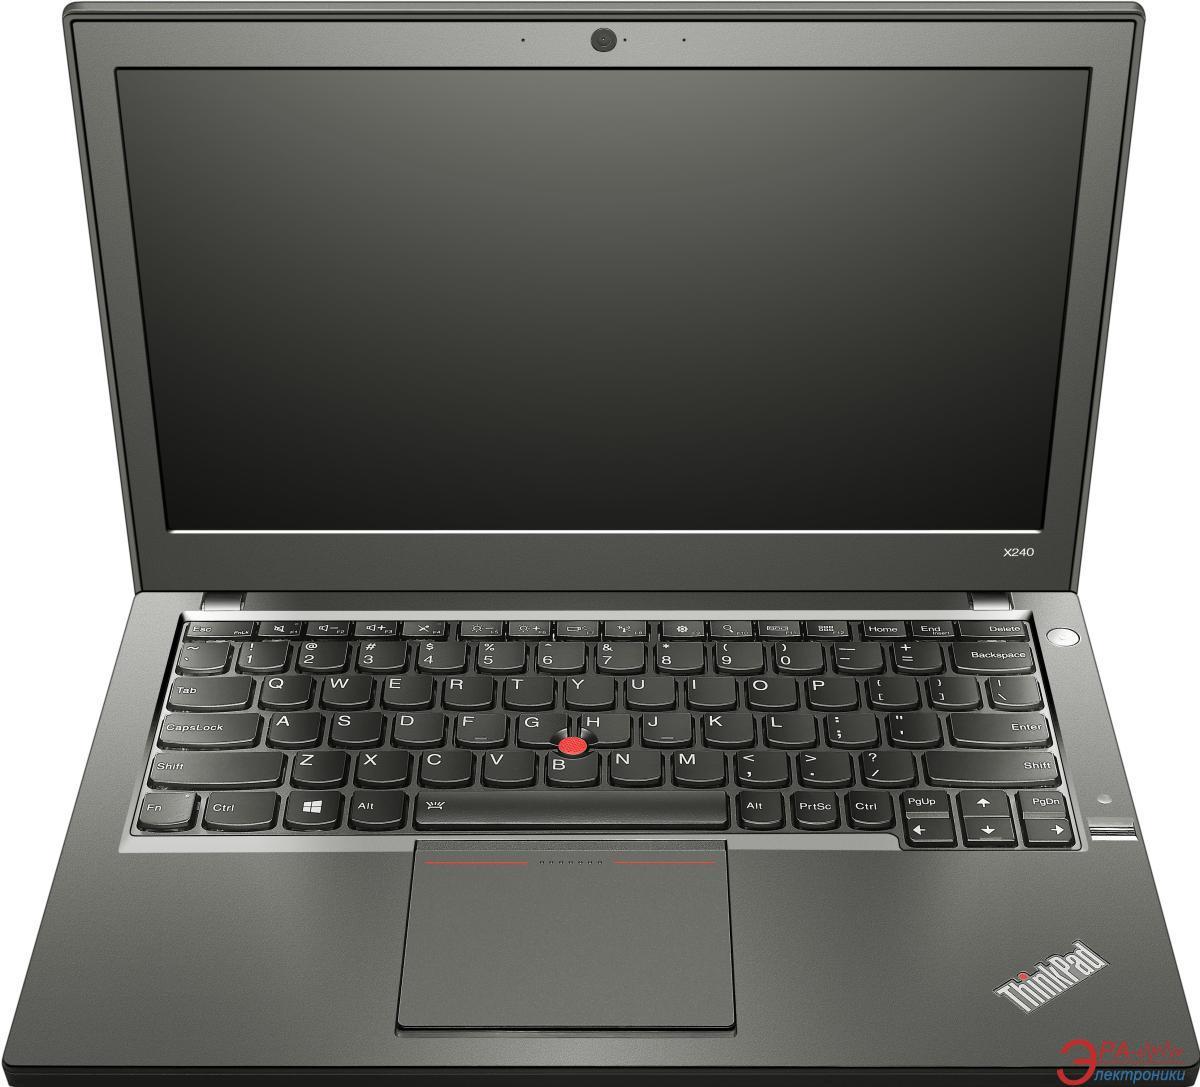 Нетбук Lenovo ThinkPad X240 (20AL0005RT) Black 12.5